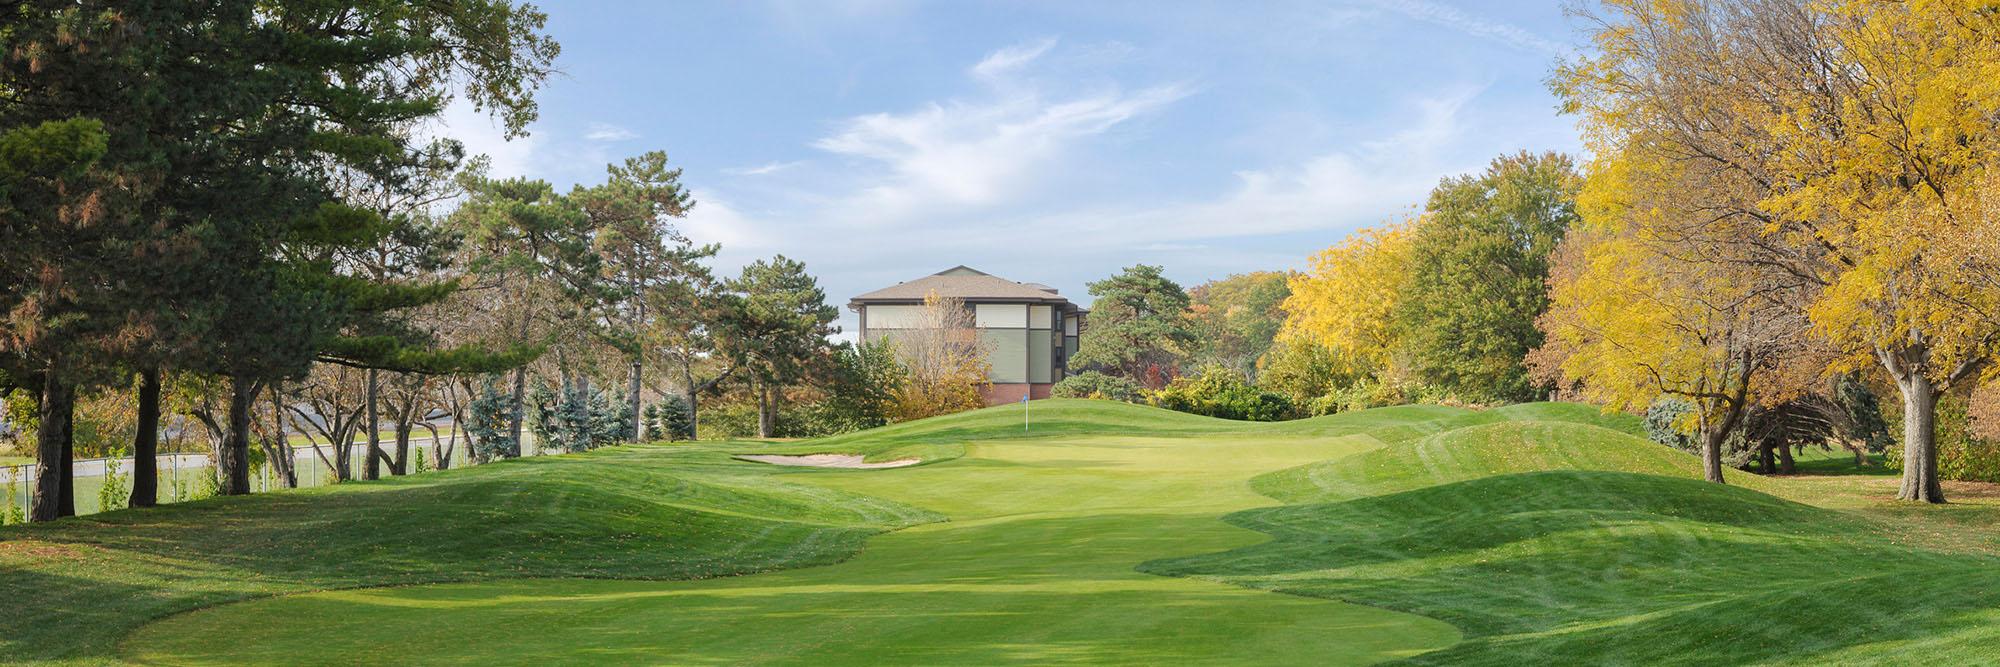 Oak Hills Country Club